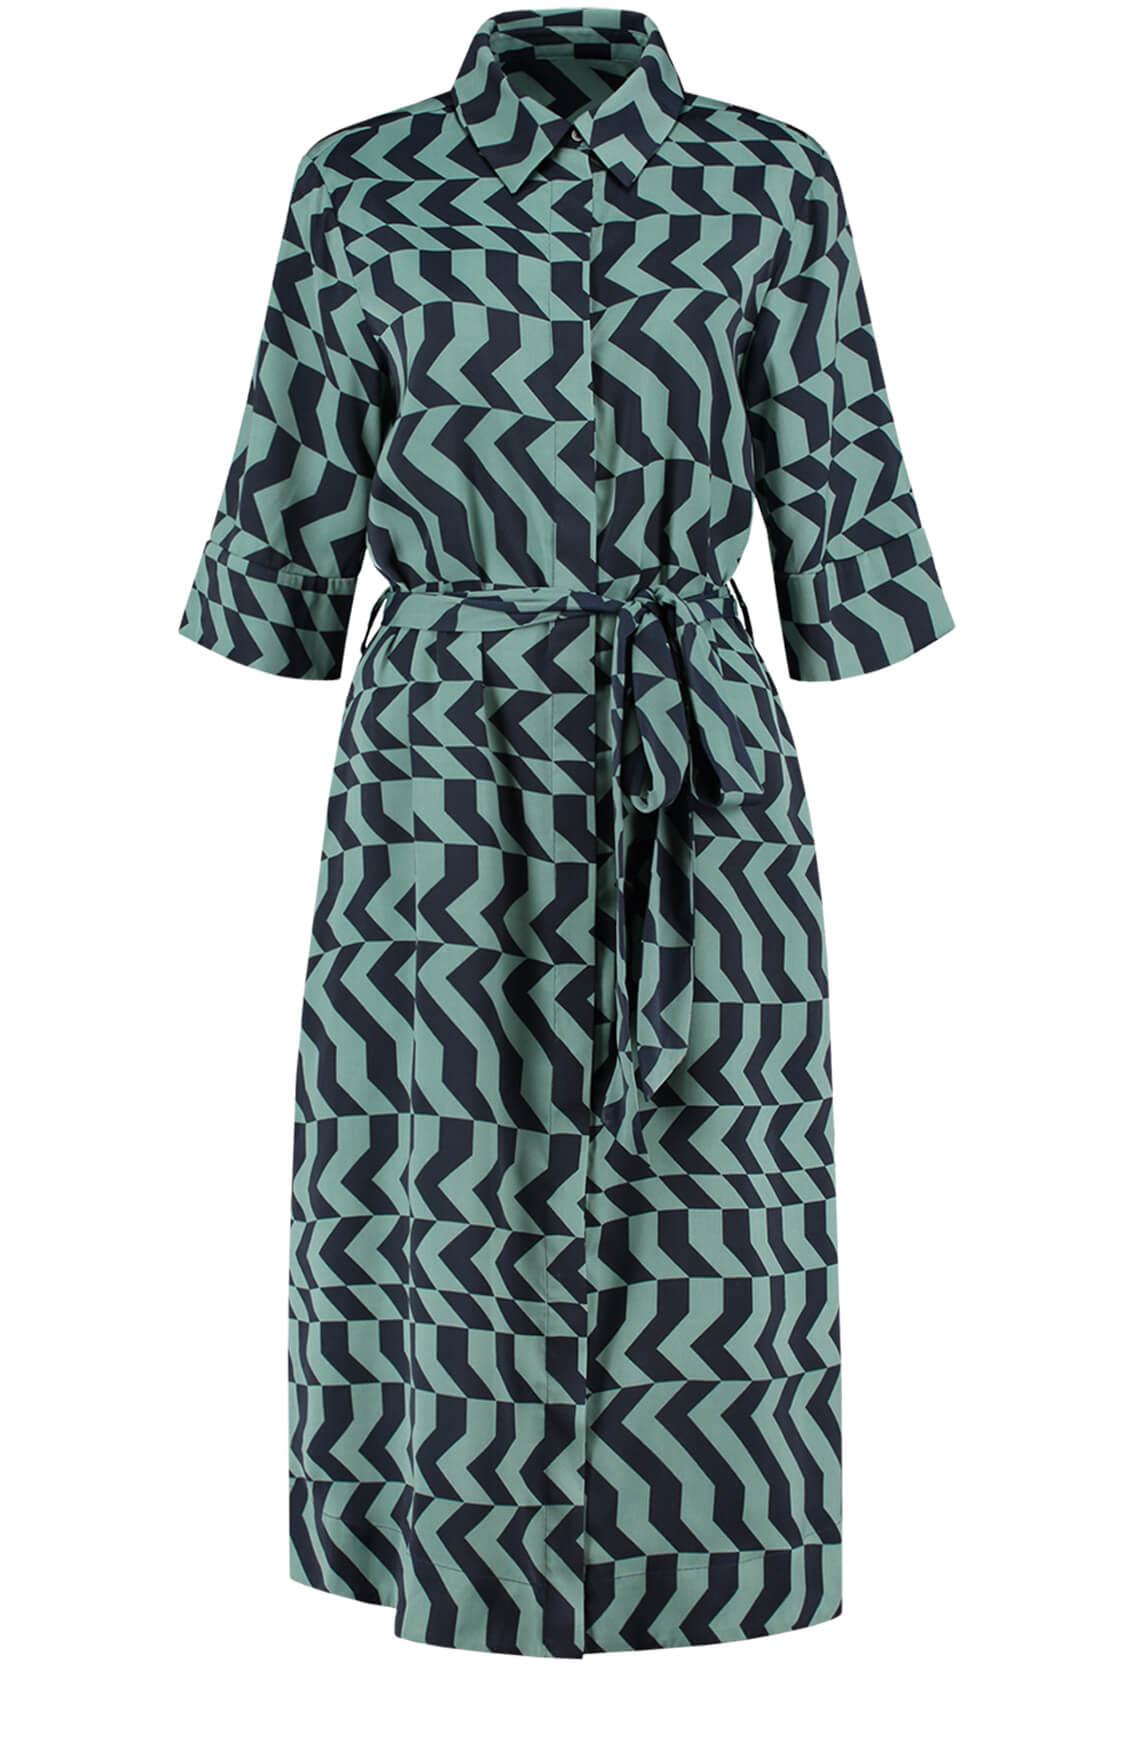 Fifth House Dames Rara lange zigzag jurk groen